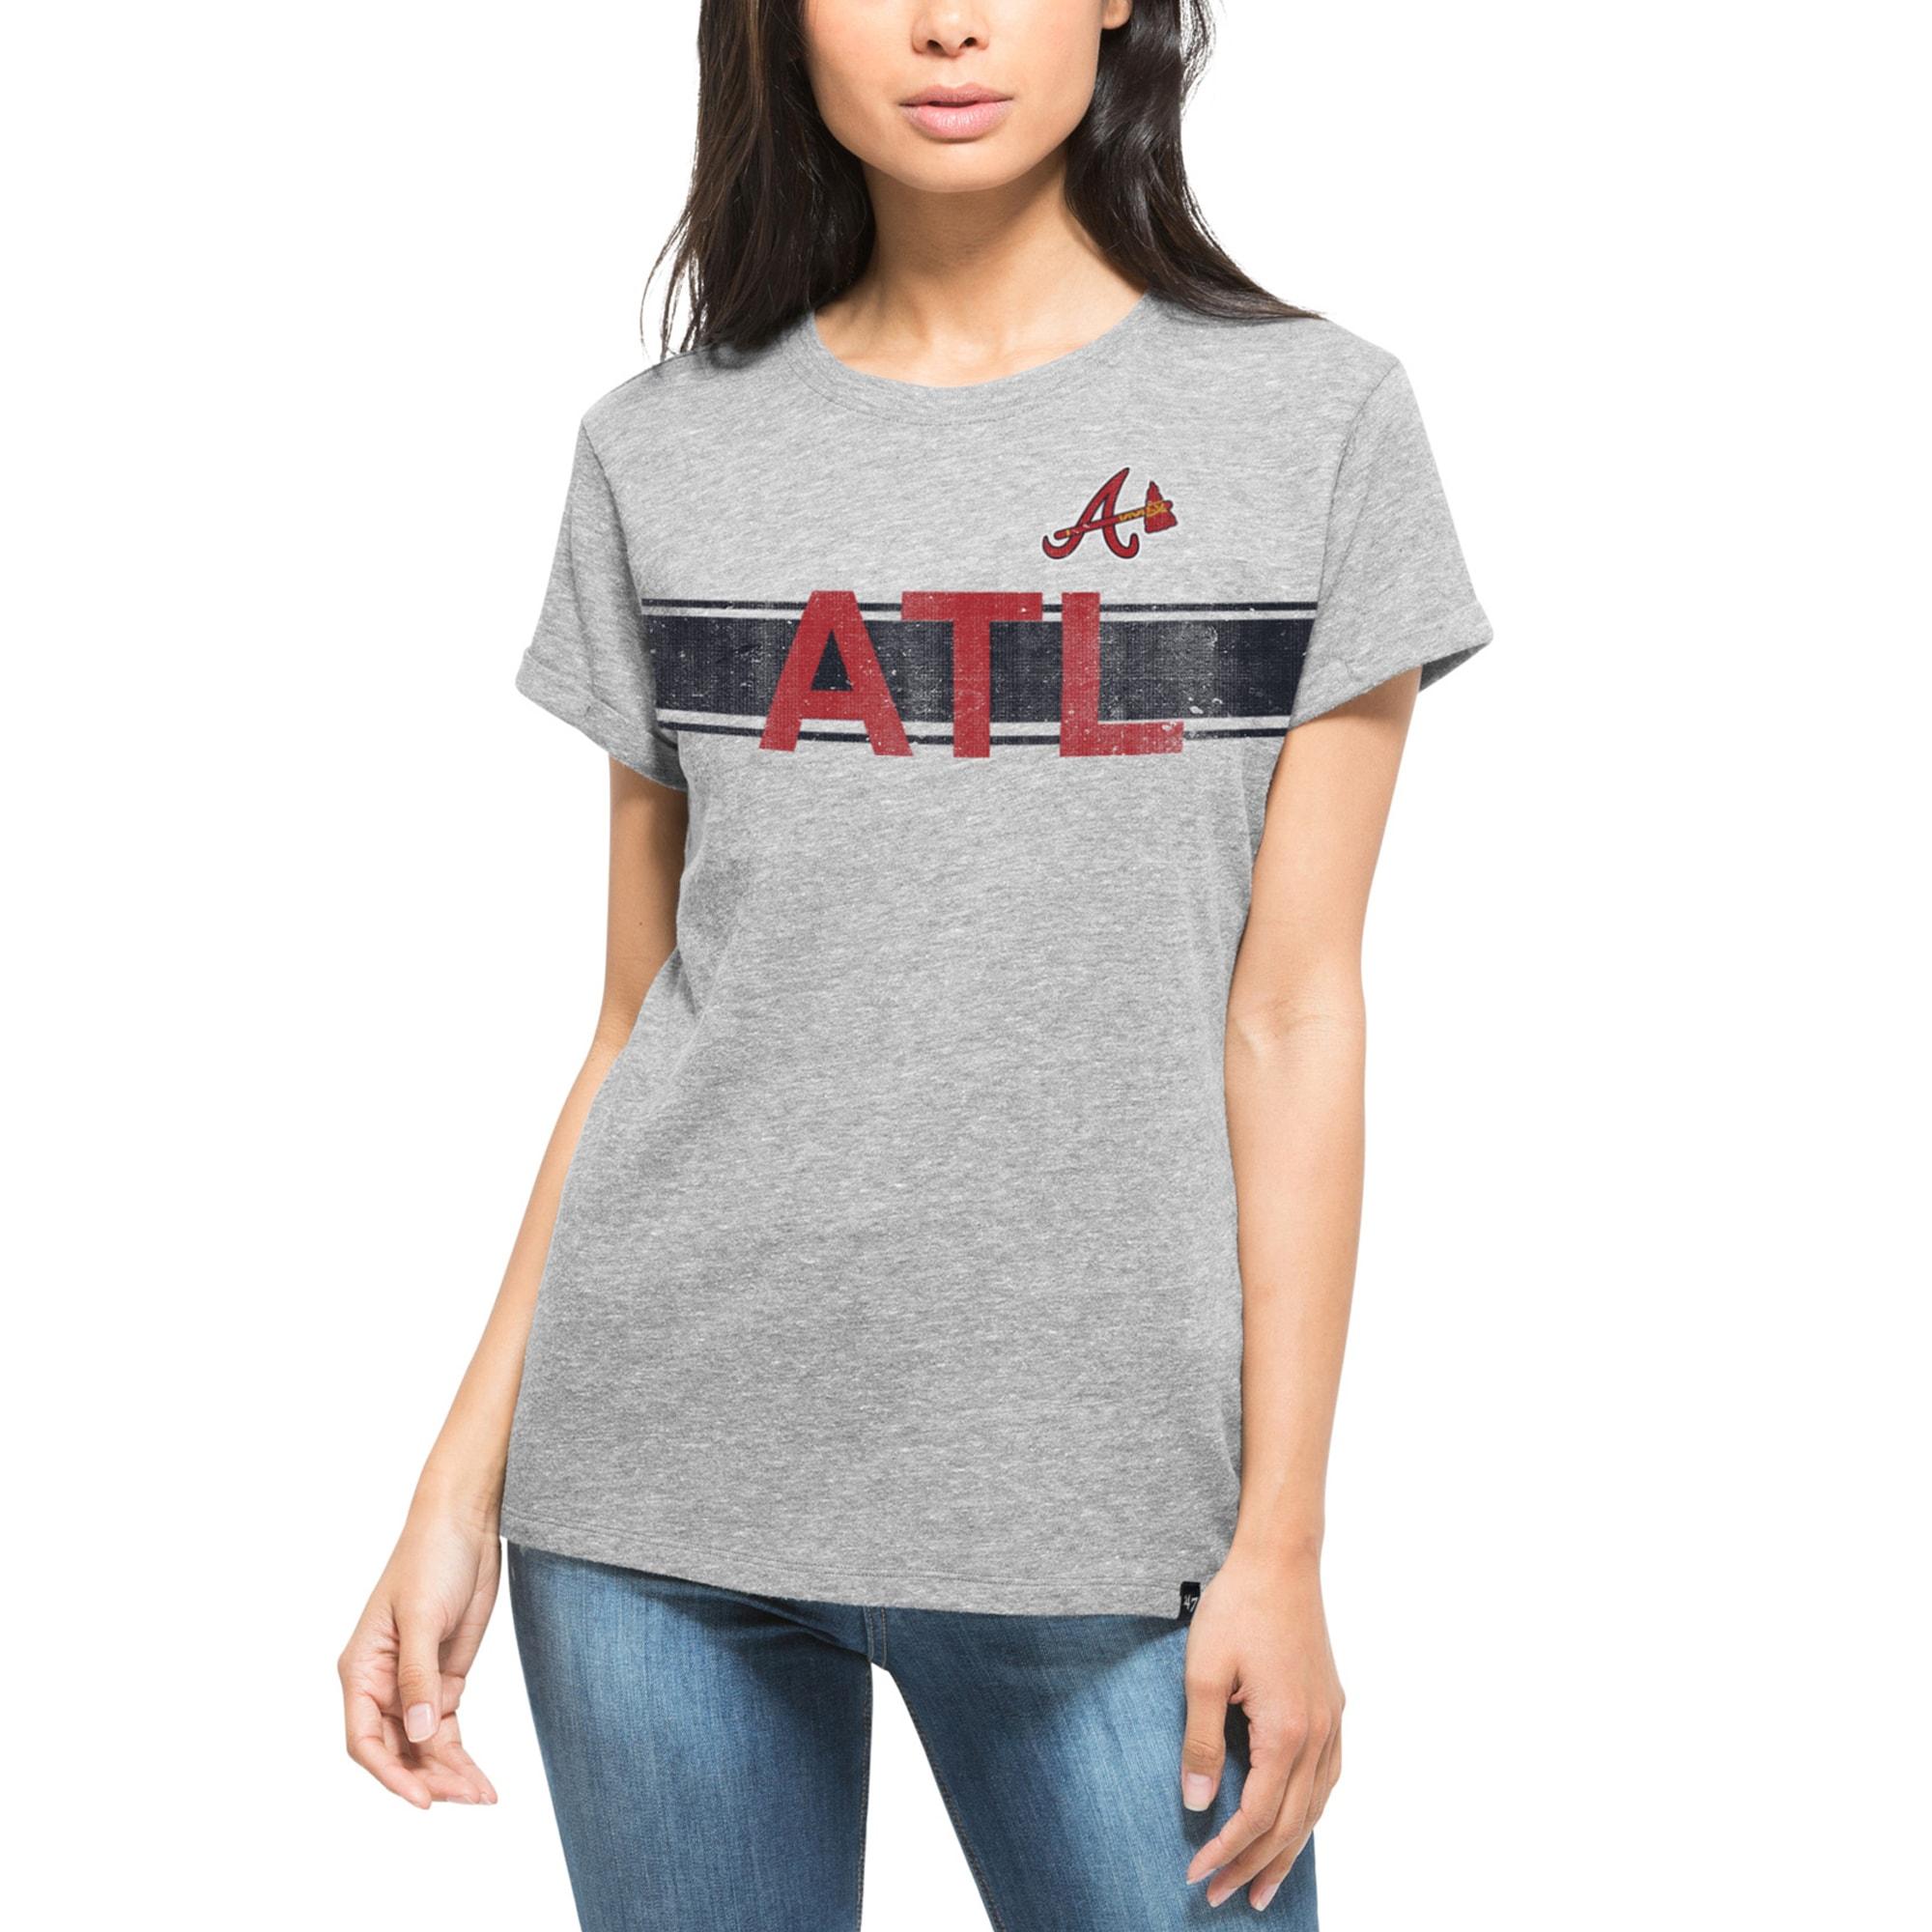 Atlanta Braves '47 Women's Super Hero Boyfriend Fit T-Shirt - Heather Gray